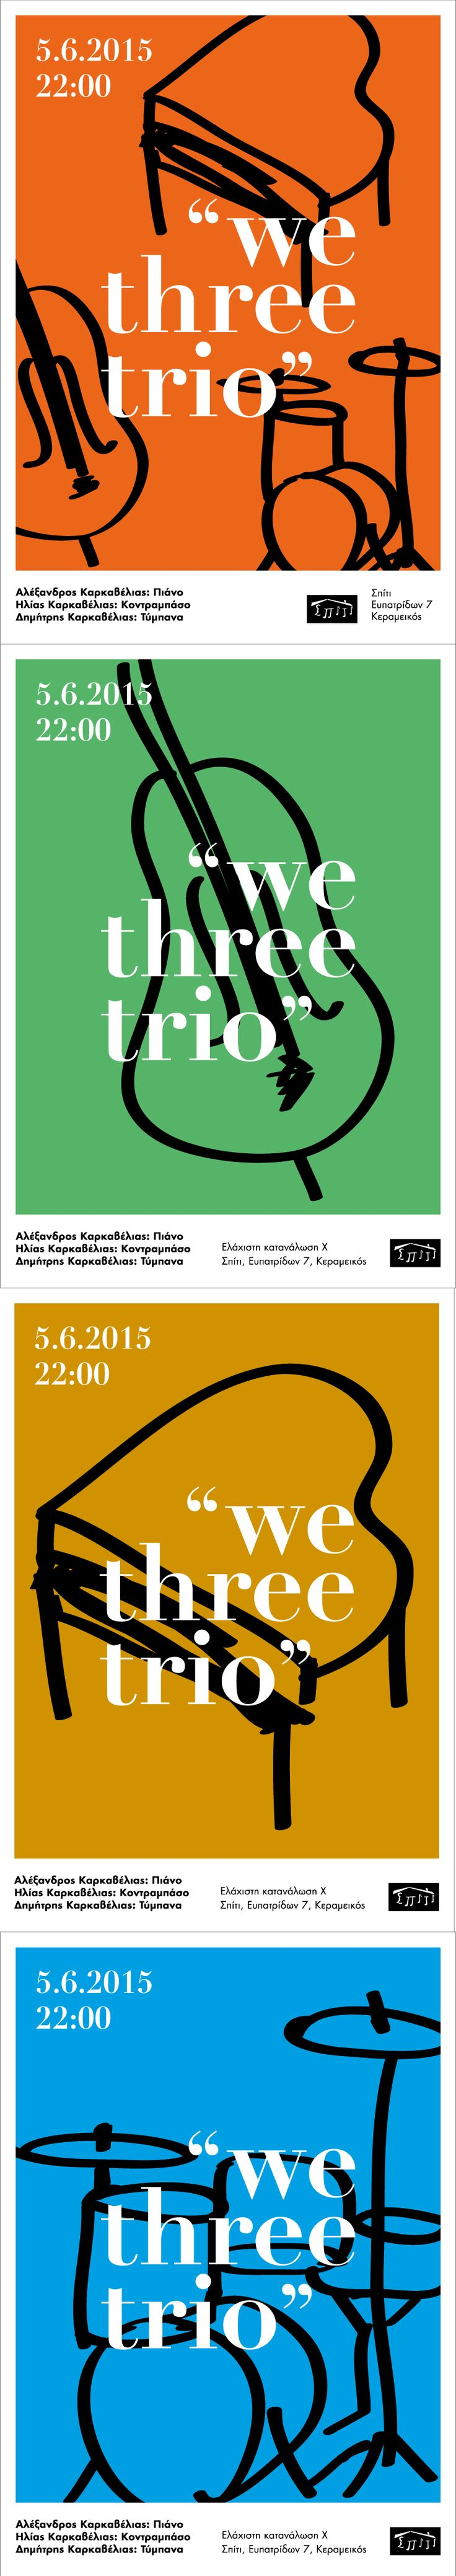 We three trio posters by Sofia Braila